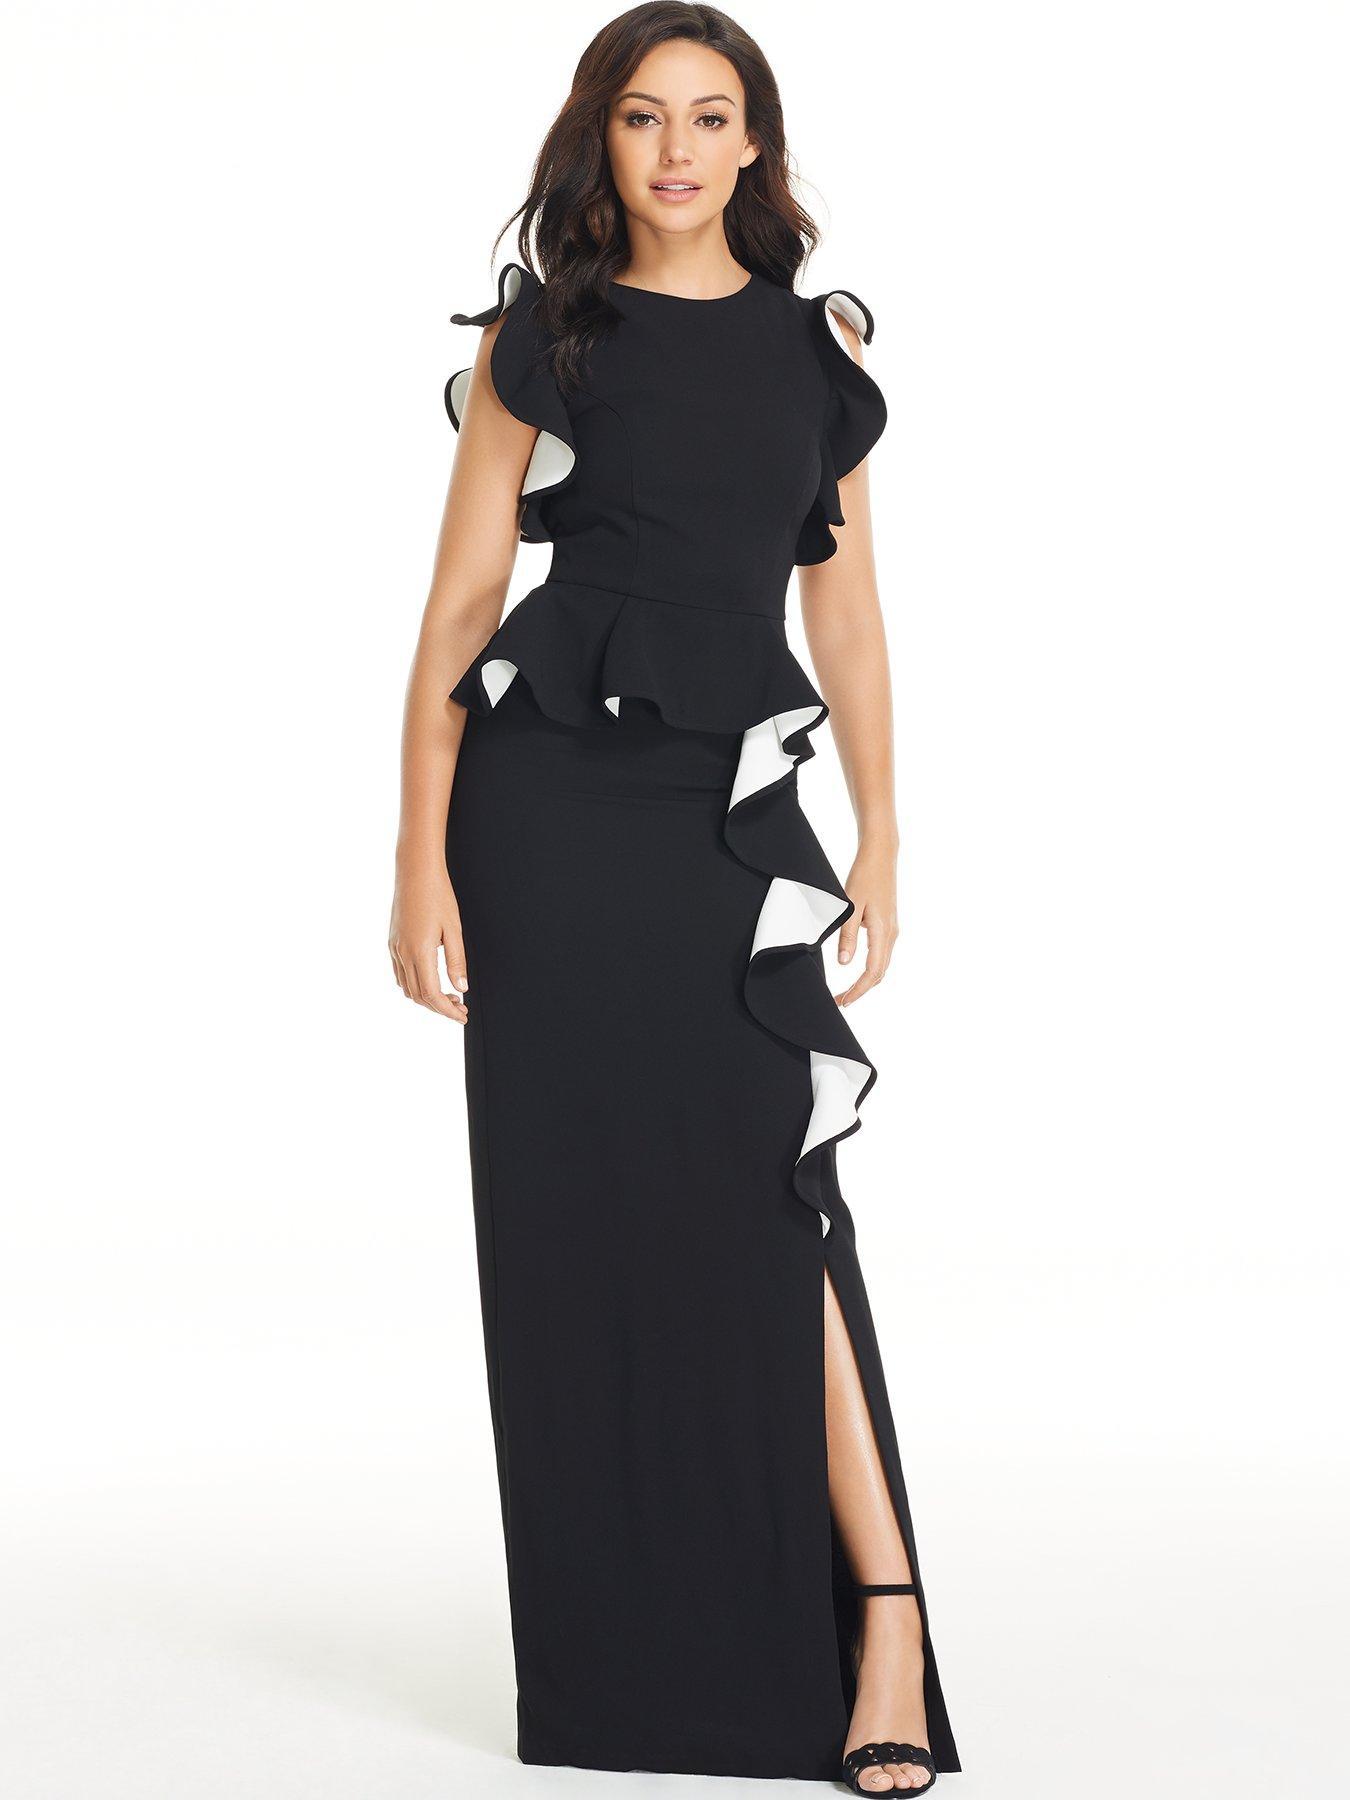 Lycra dresses uk cheap